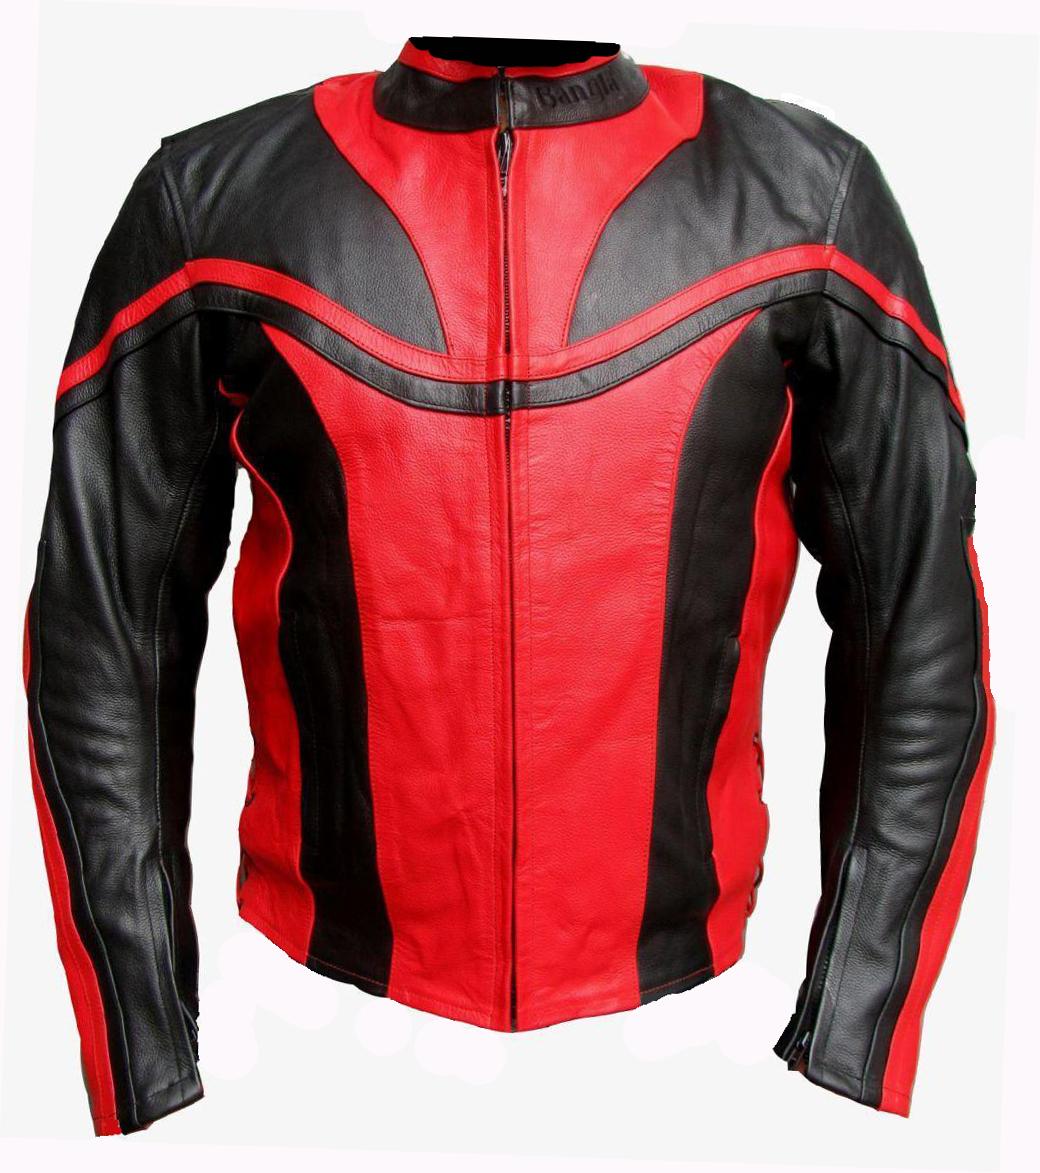 Motorrad Jacke Lederjacke Rot Schwarz Racing Leder M L XL XXL